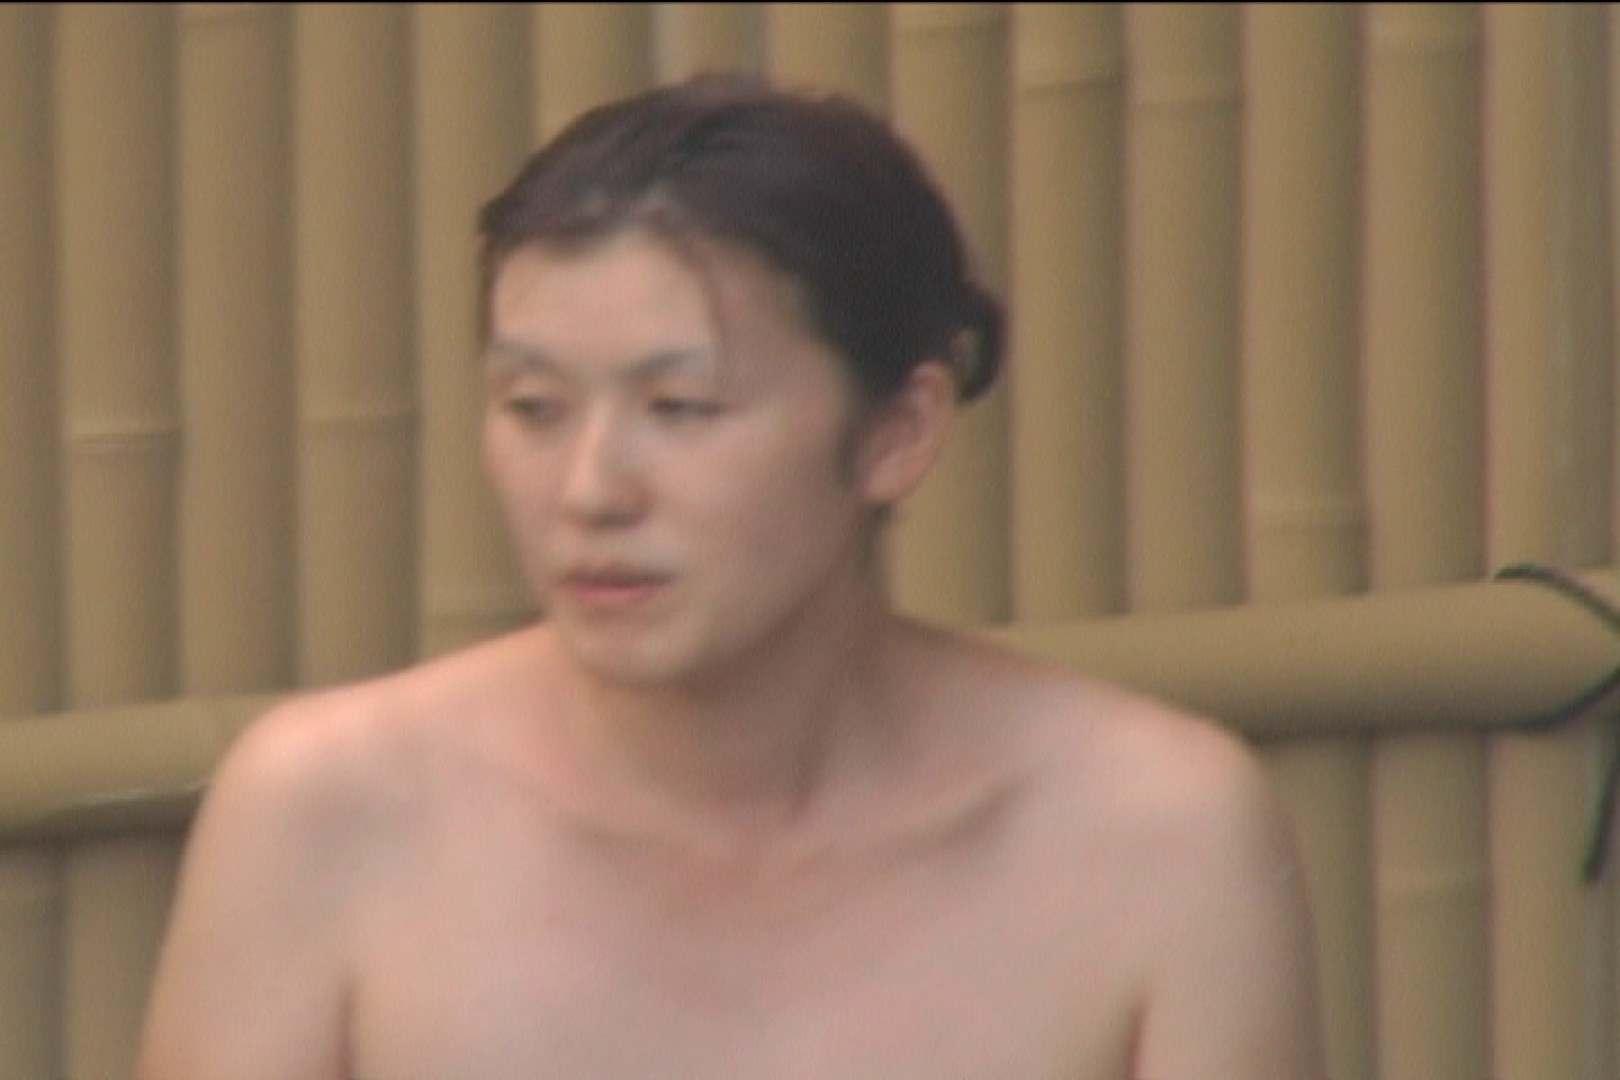 Aquaな露天風呂Vol.532 OLセックス 盗撮ワレメ無修正動画無料 105画像 95